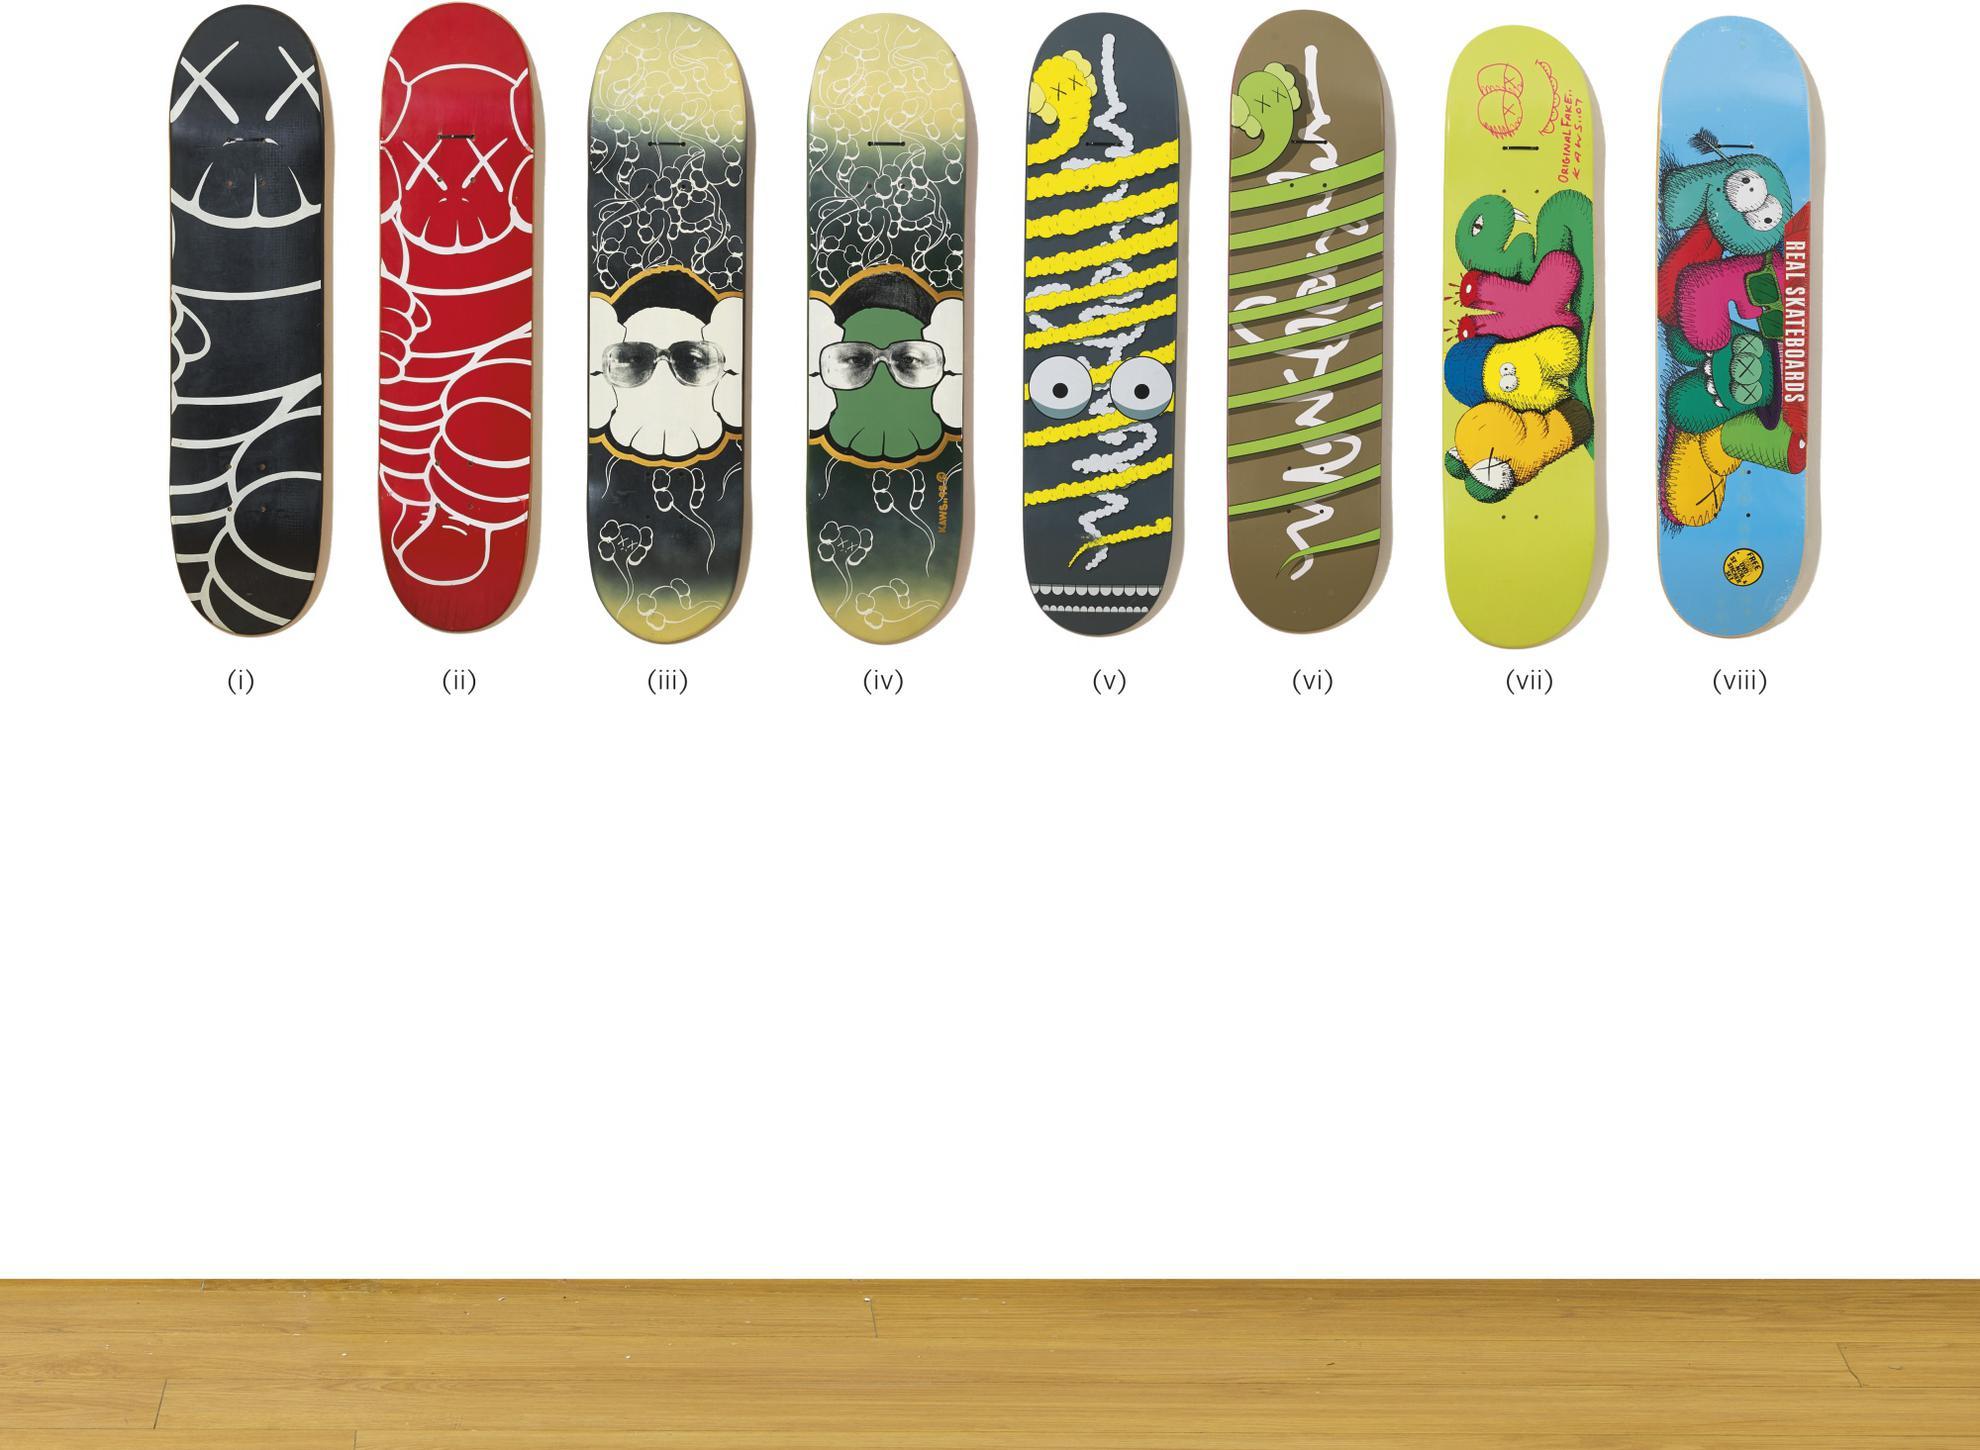 KAWS-Skateboard Decks (Eight Works)-2007